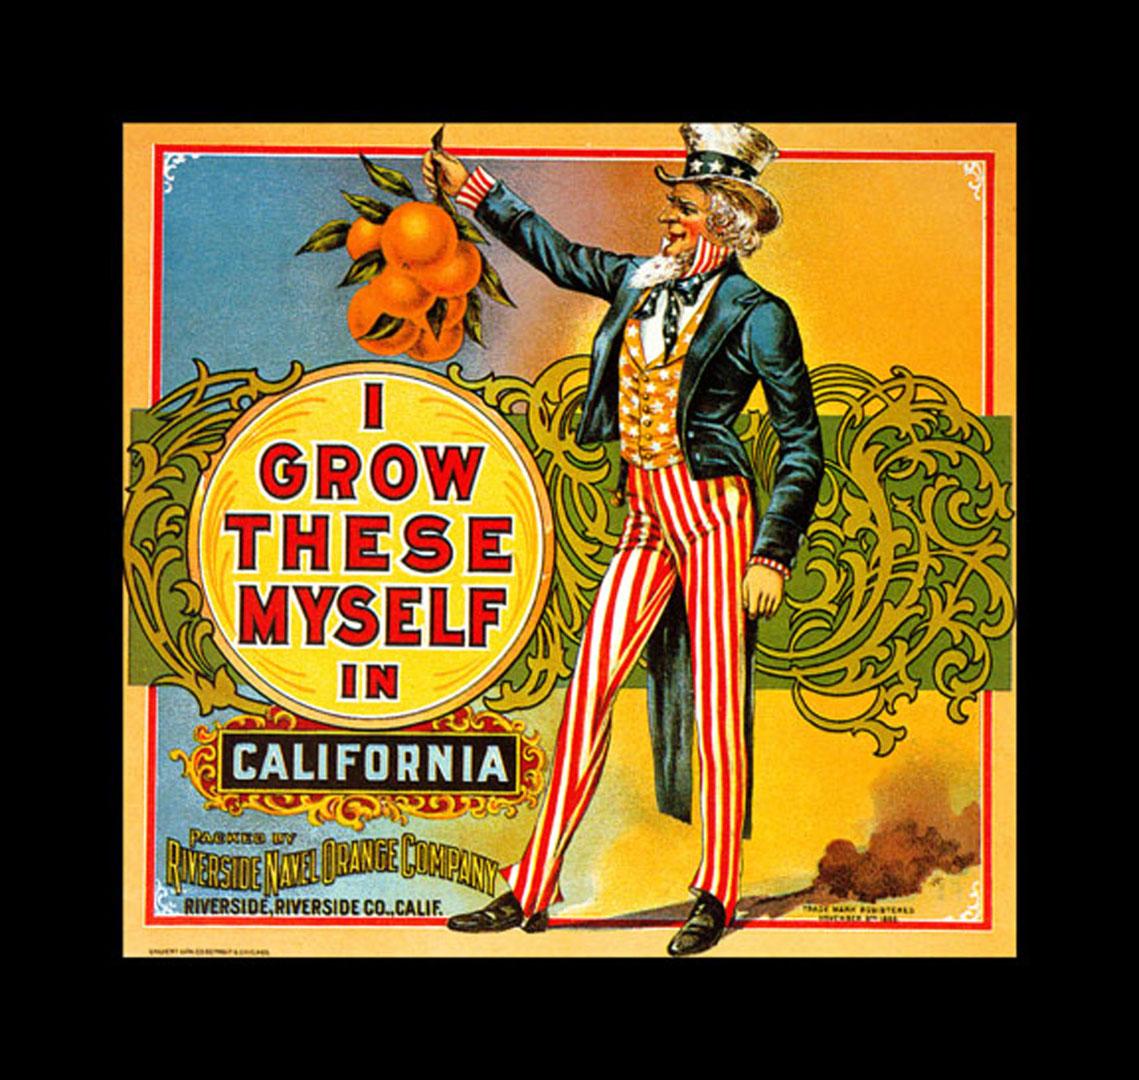 Sam California Vintage Fruit Crate Labels Wallpaper Image 1139x1080